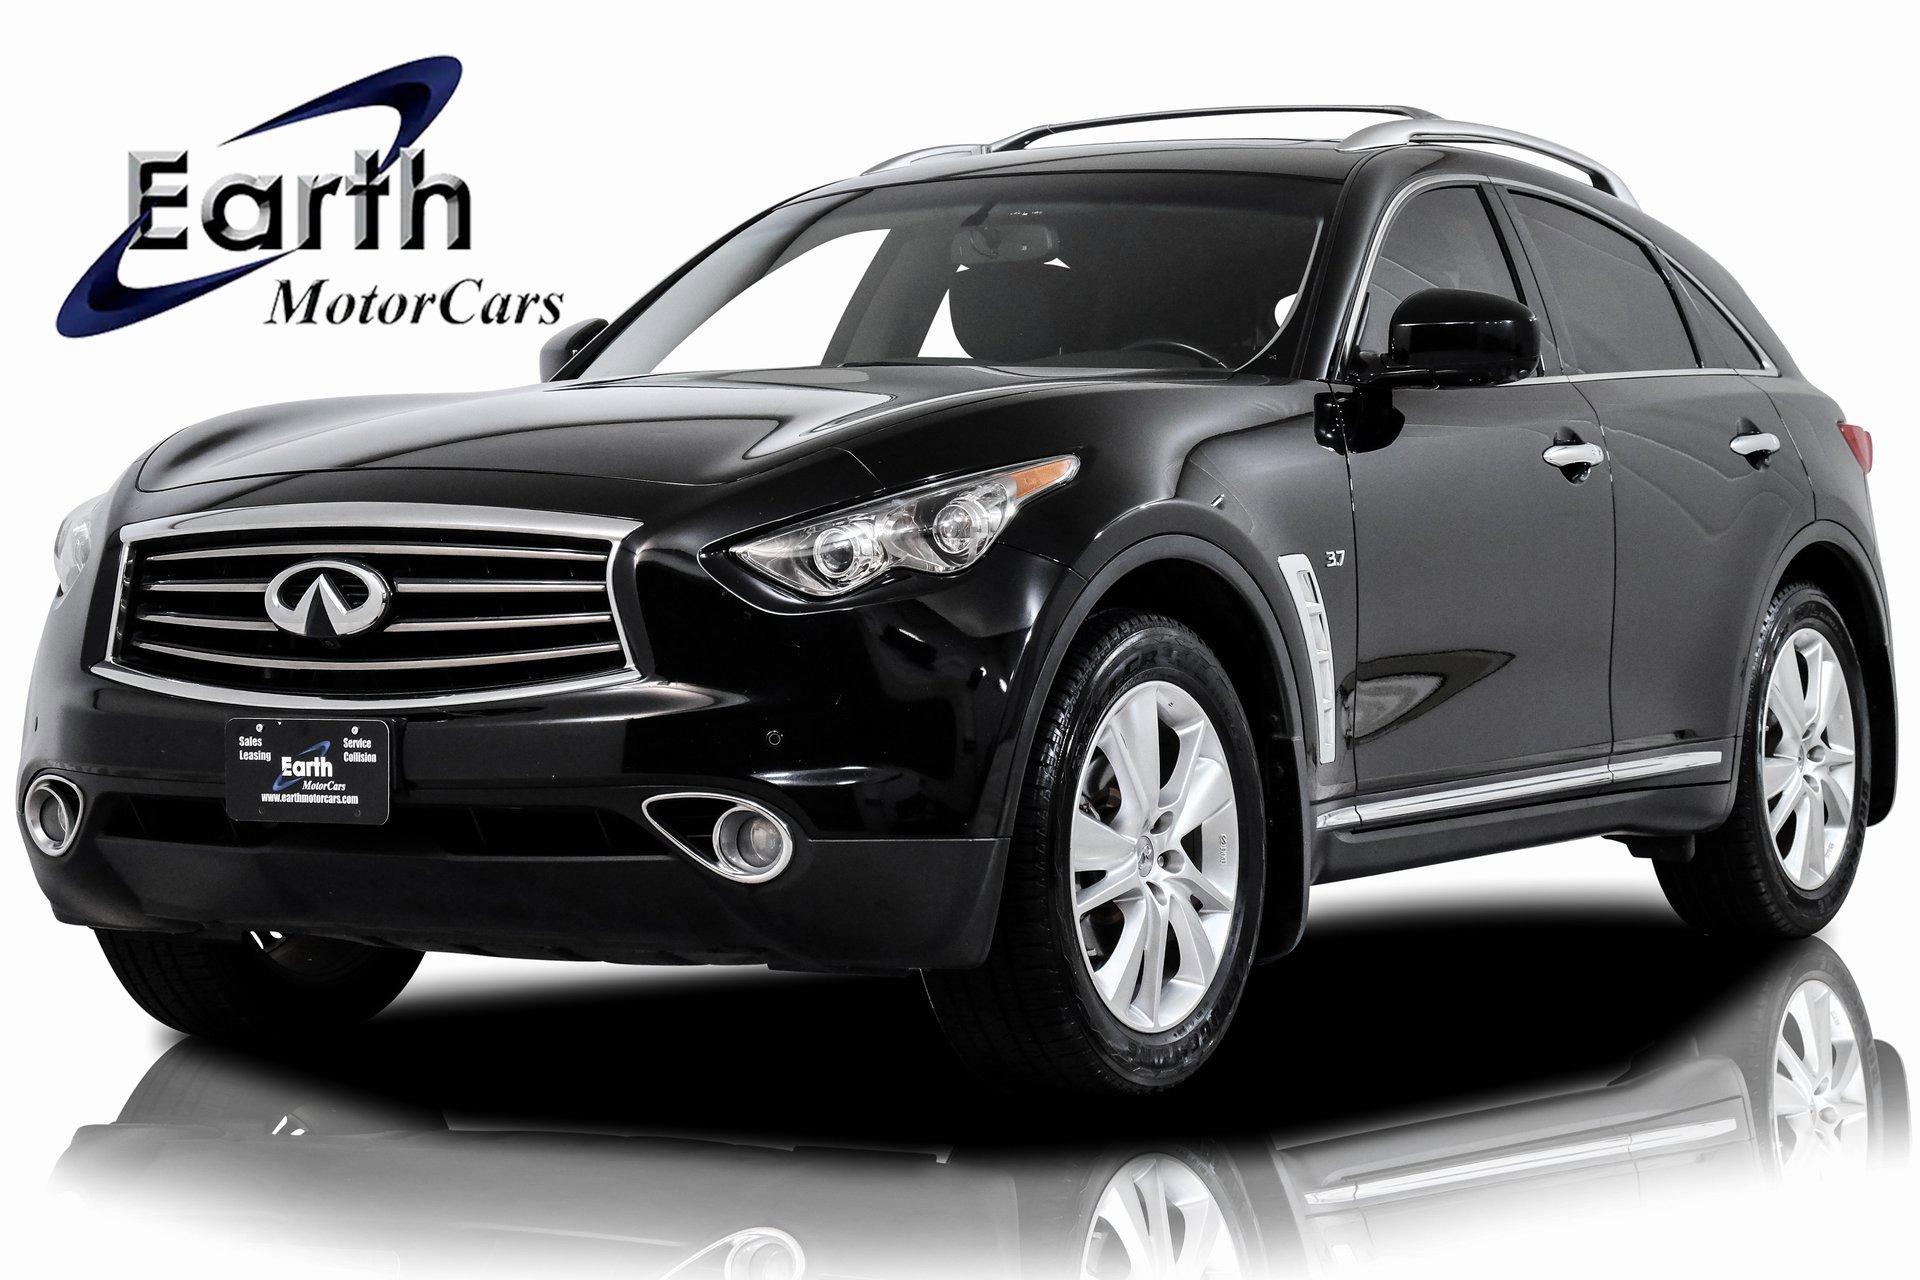 2014 INFINITI QX70 2WD w/ Premium Package image